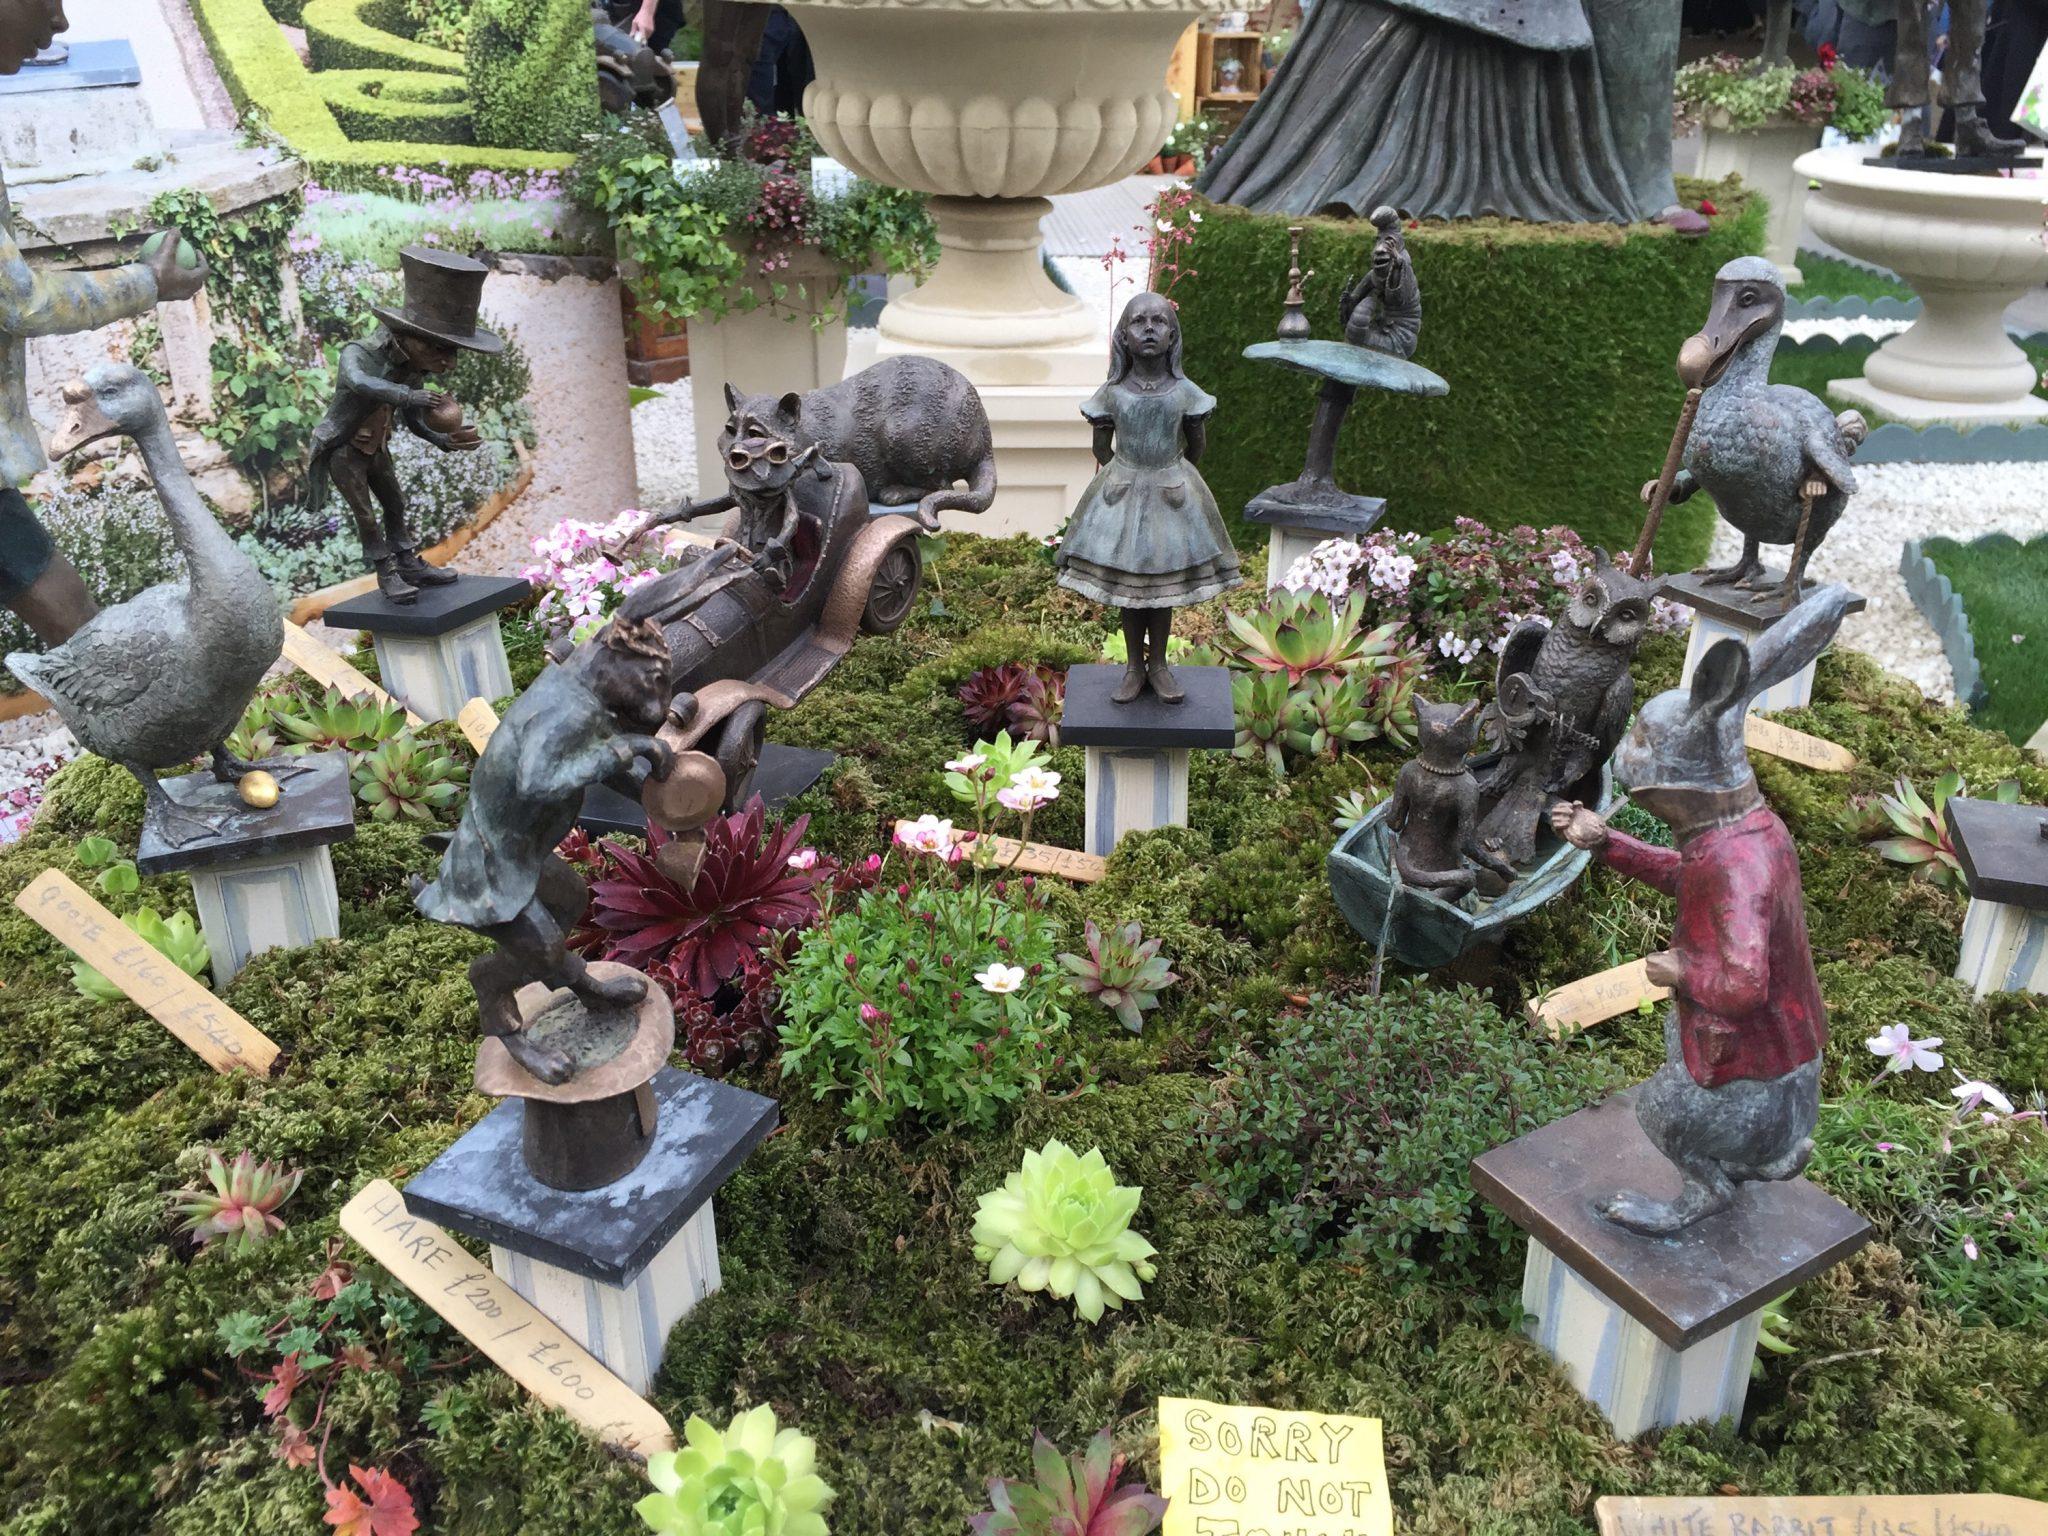 Robert James Miniature Sculptures Chelsea Flower Show